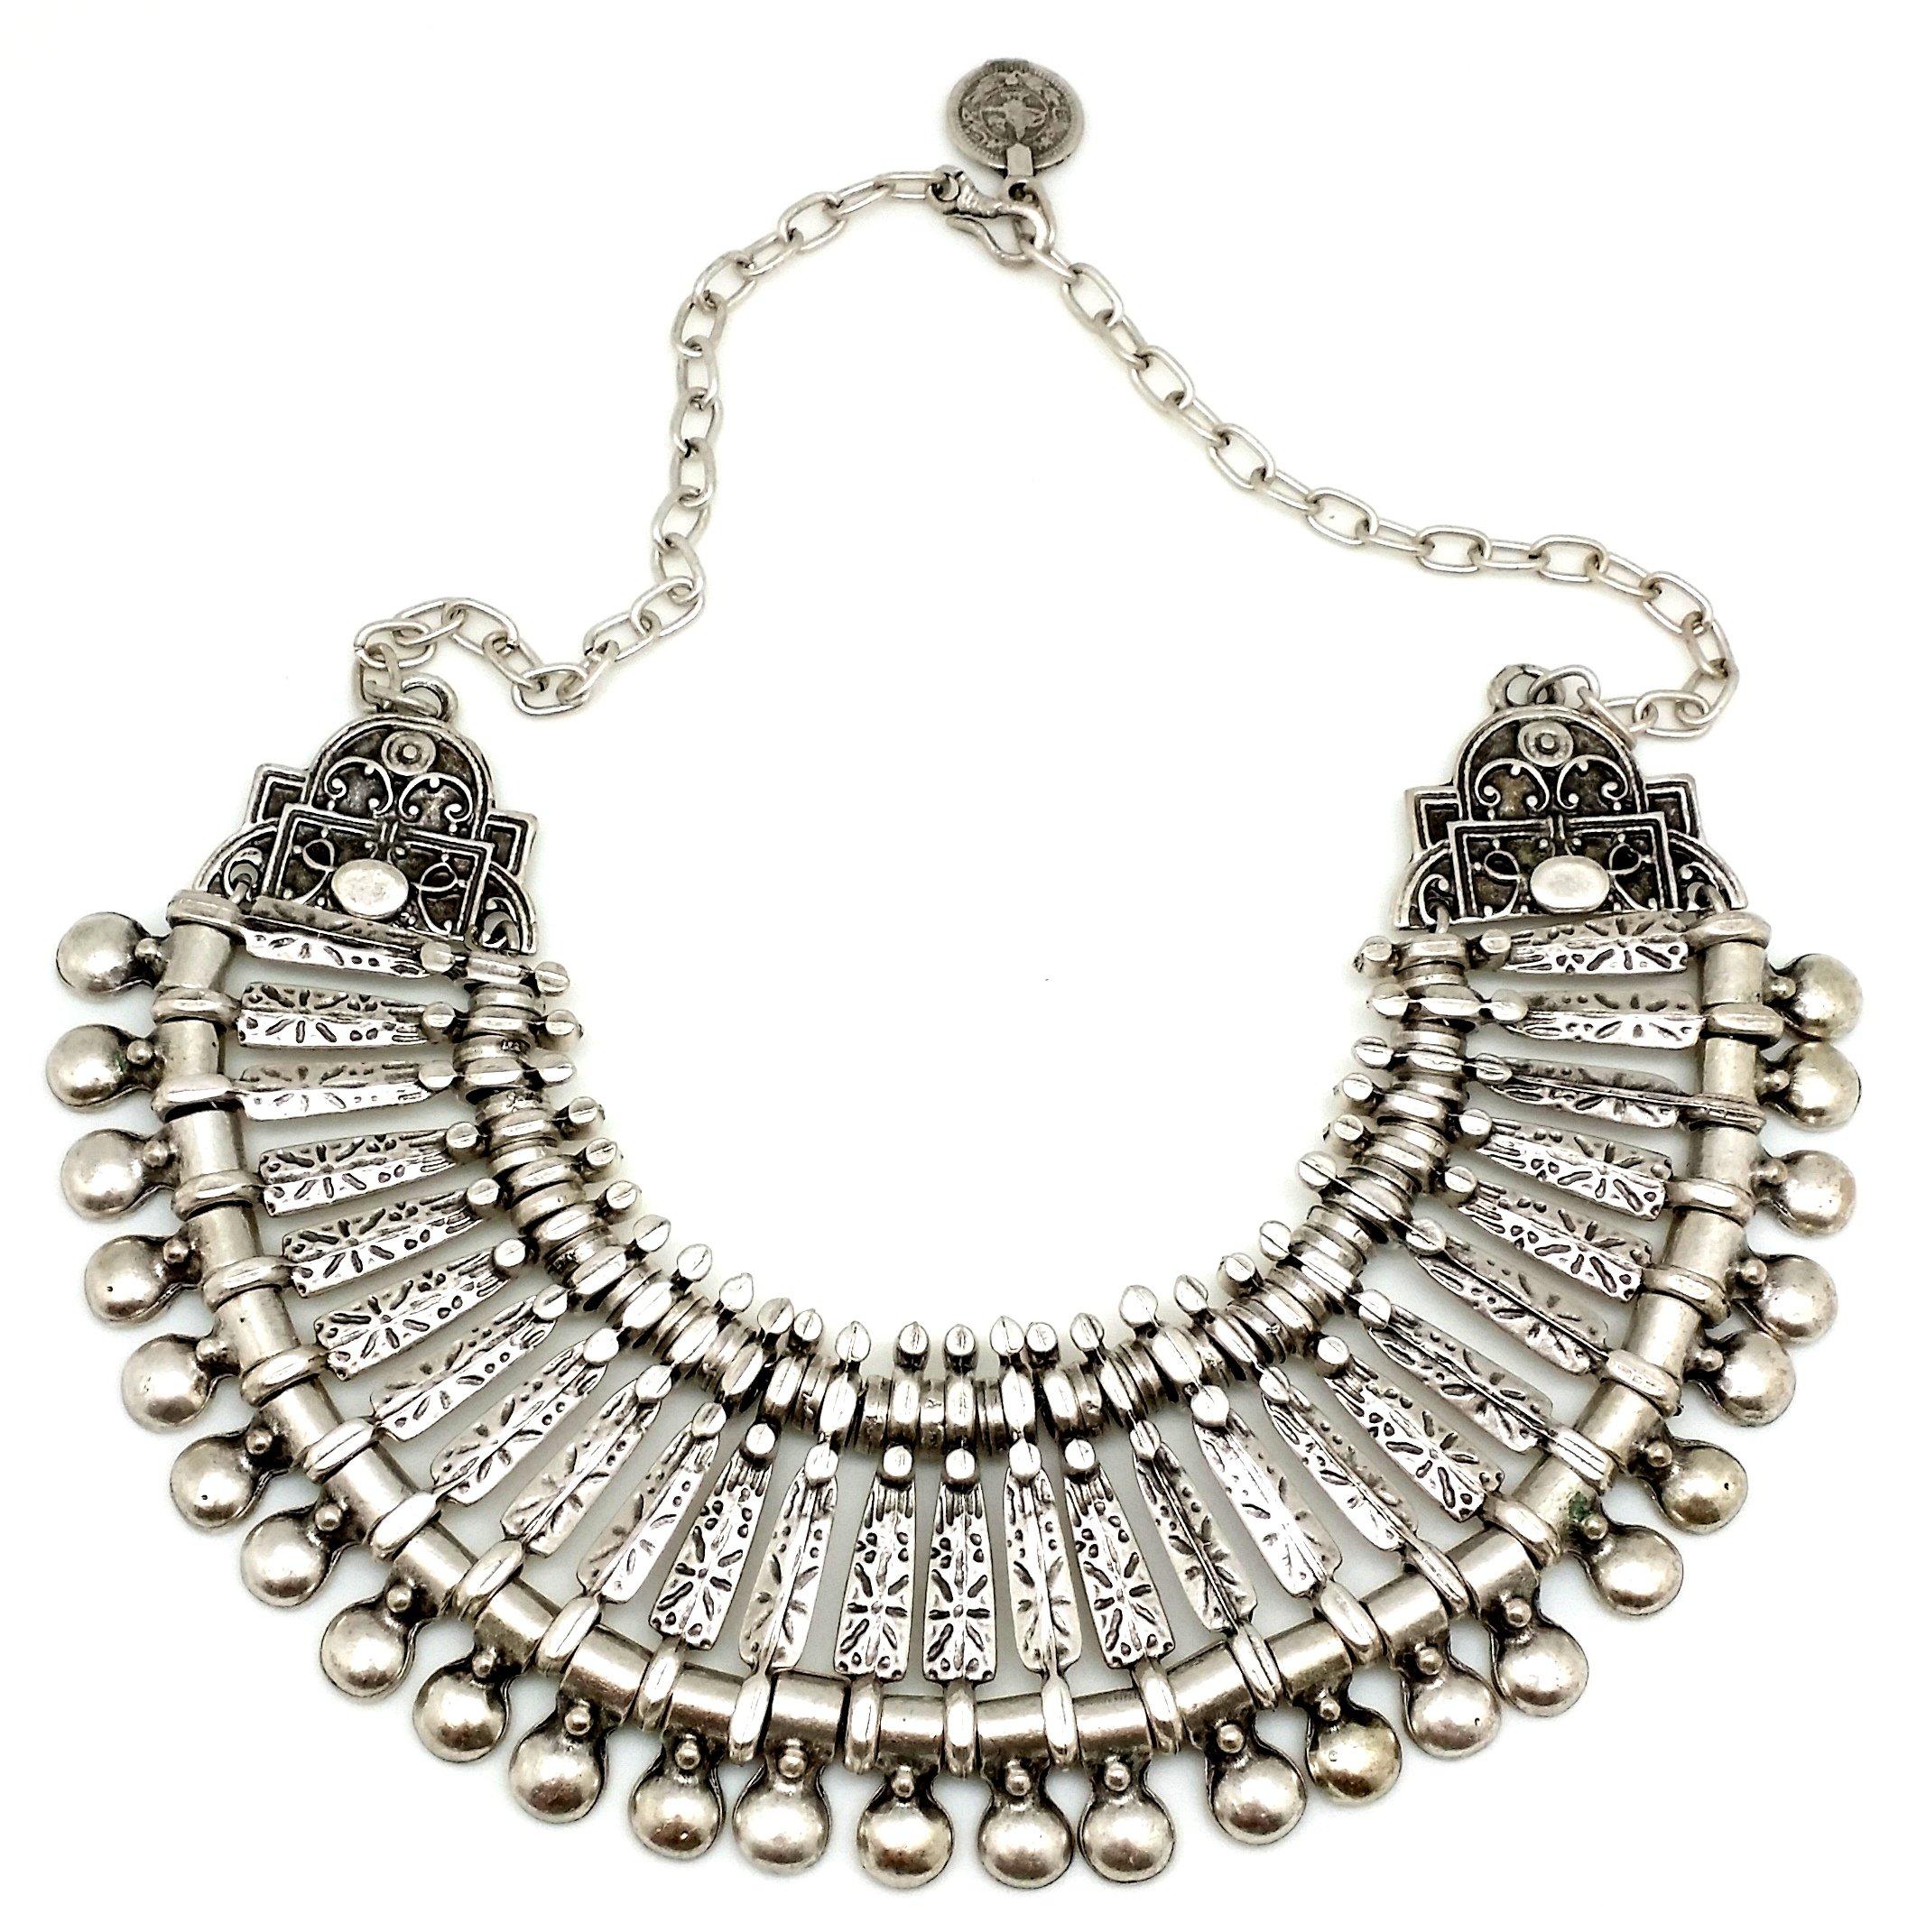 The Serro Gypsy Style Bohemian Turkish Vintage Silver Statement Necklace DAMANHUR 1004 by The Serro